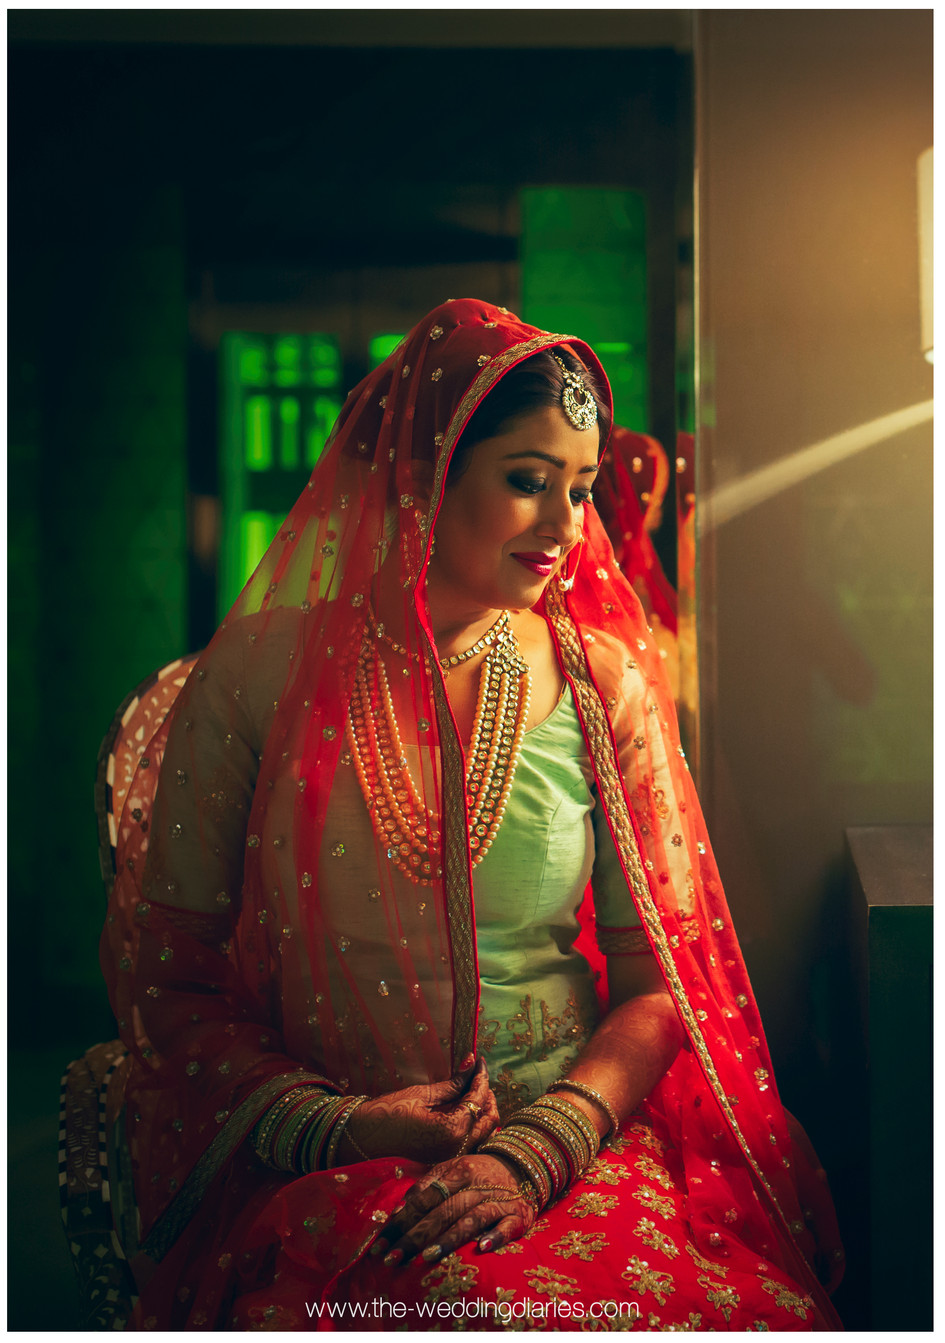 The Wedding Diaries - Bridal Portrait of Jiya